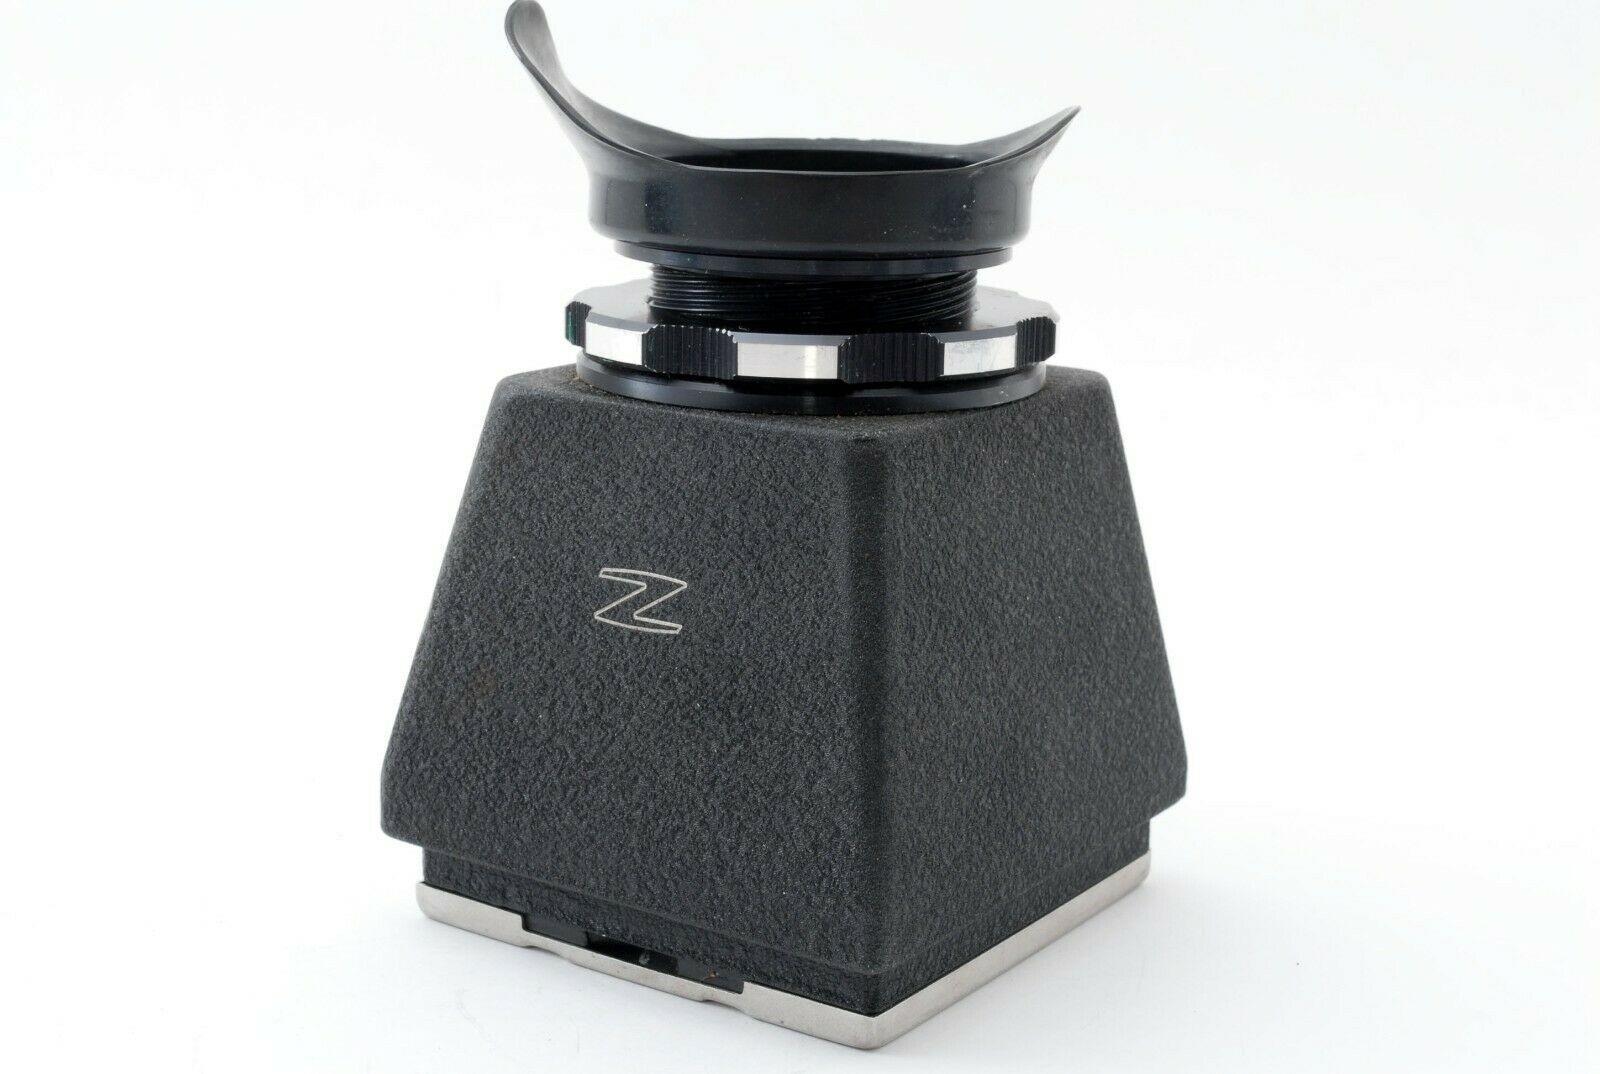 Bronica S2 magnifier finder